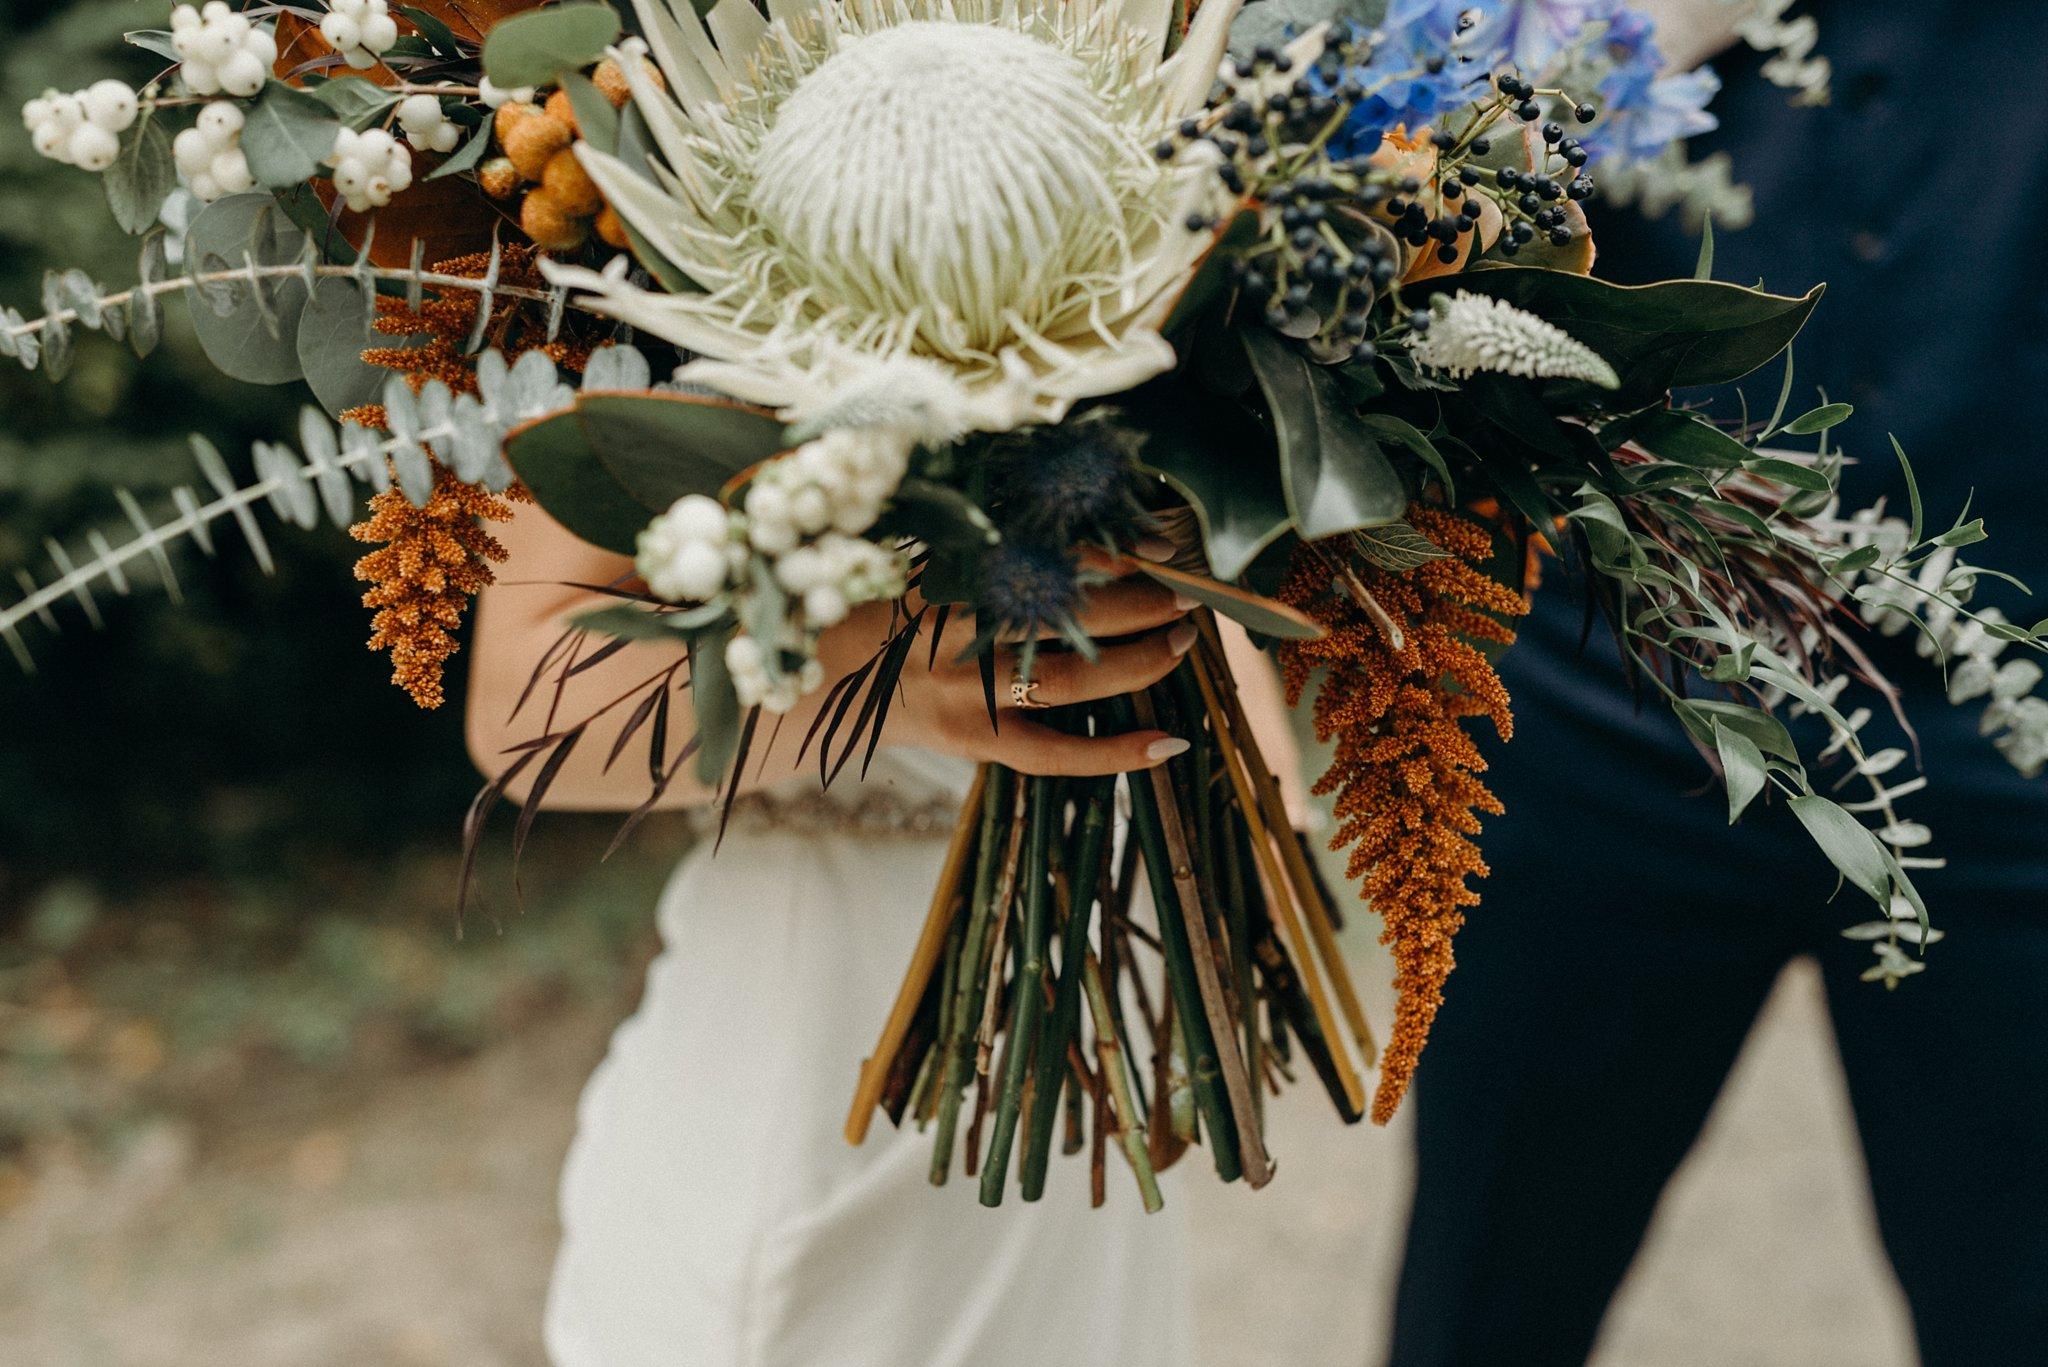 kaihla_tonai_intimate_wedding_elopement_photographer_6605.jpg